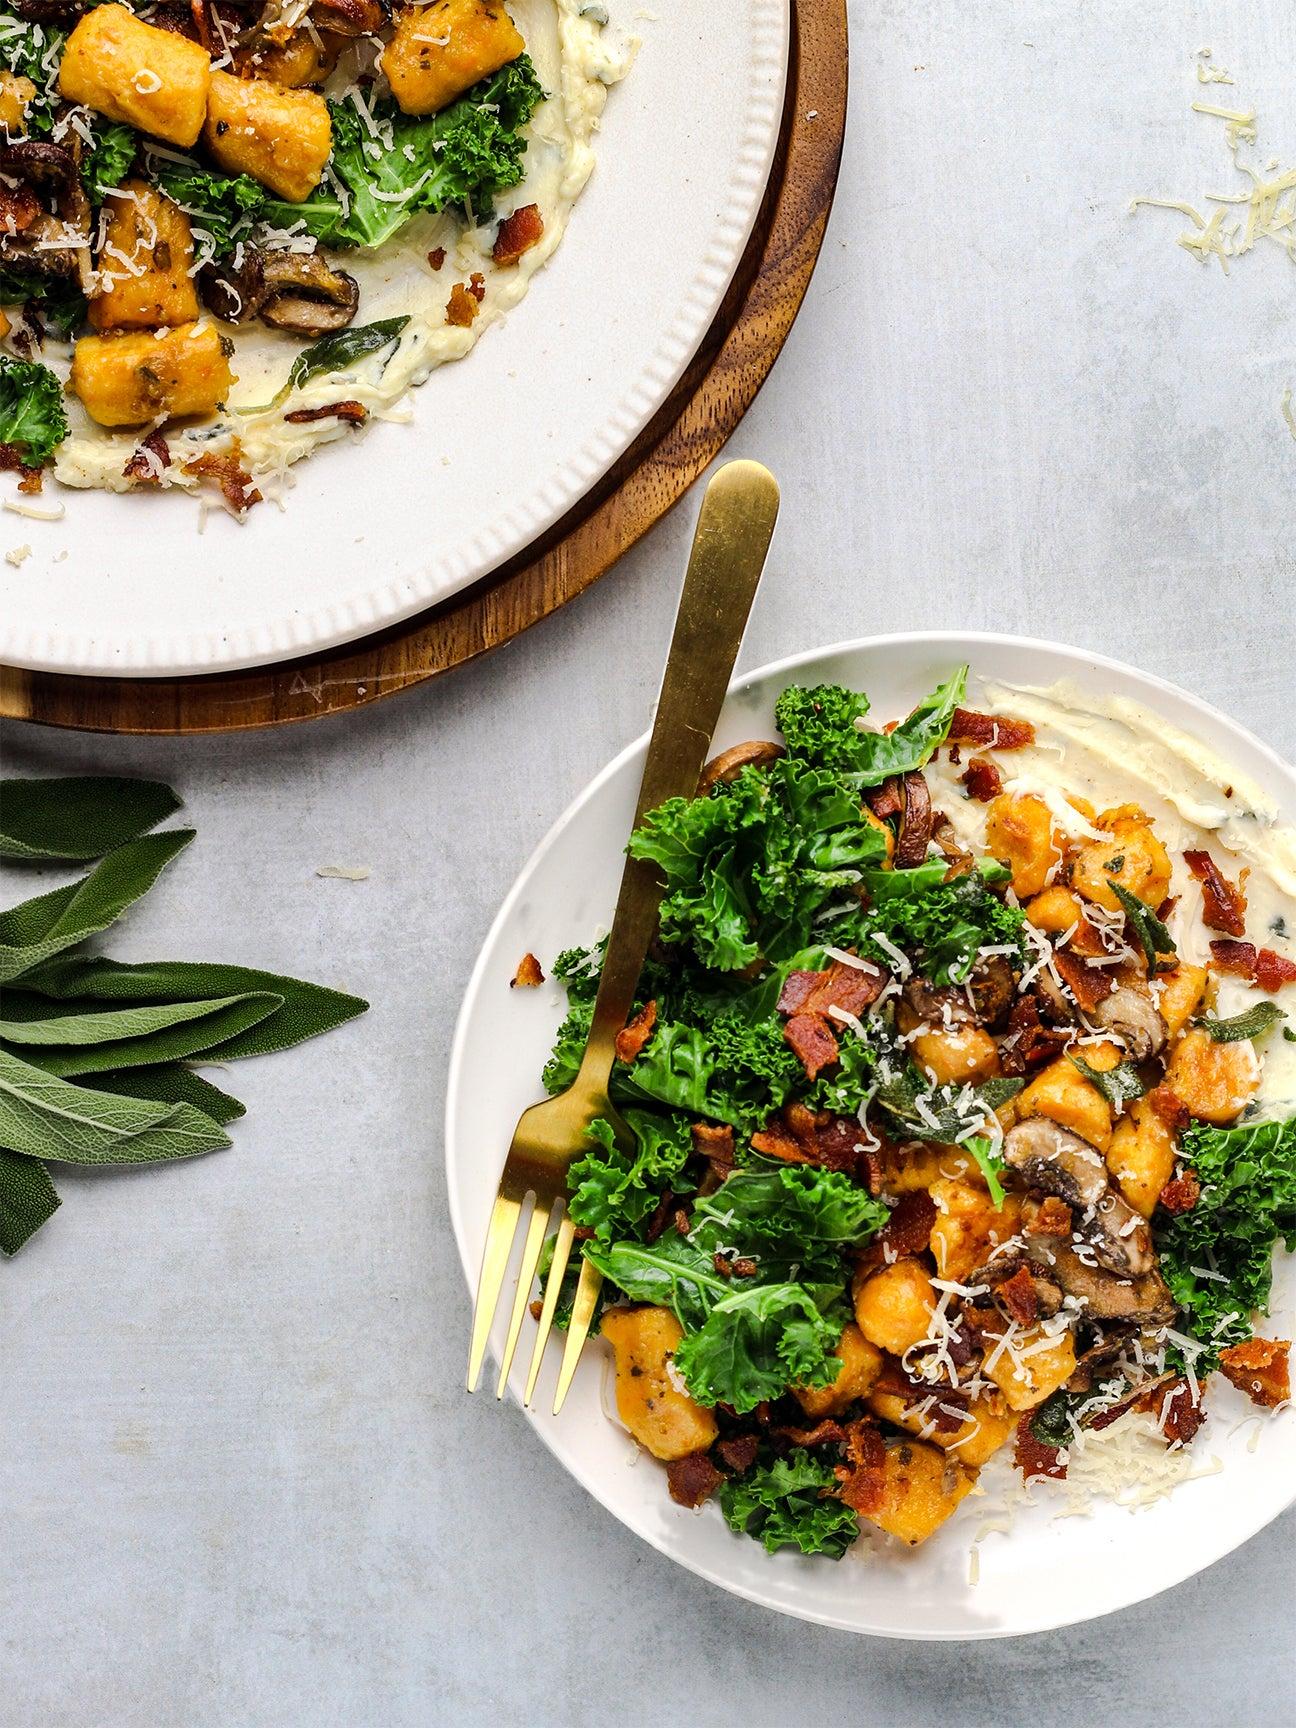 sheet pan sweet potato gnocchi with salad